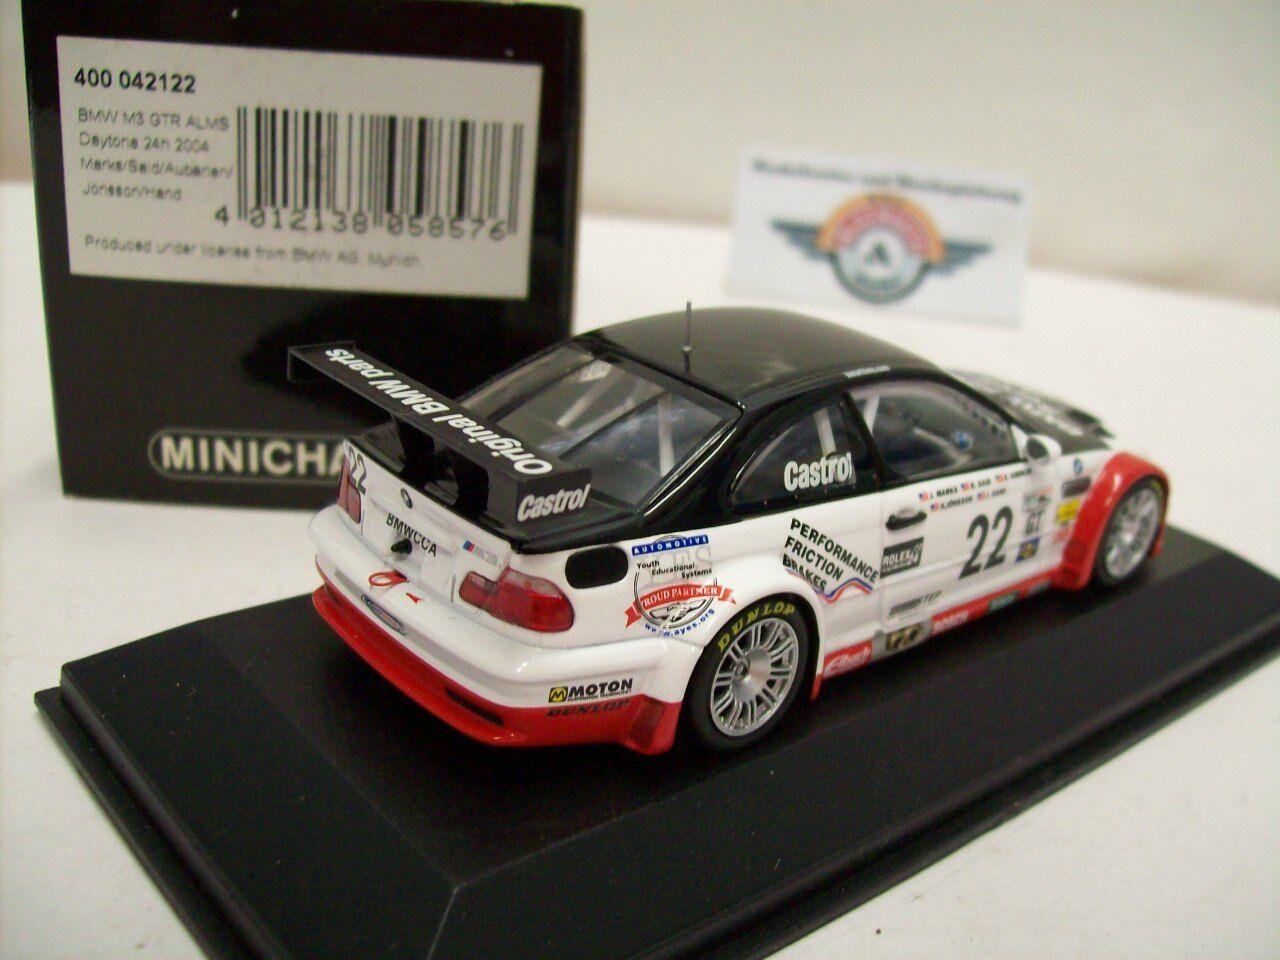 Bmw m3 GTR GTR GTR  22 ALMS  24h Daytona 2004 , Minichamps 1 43, embalaje original c3ca6d